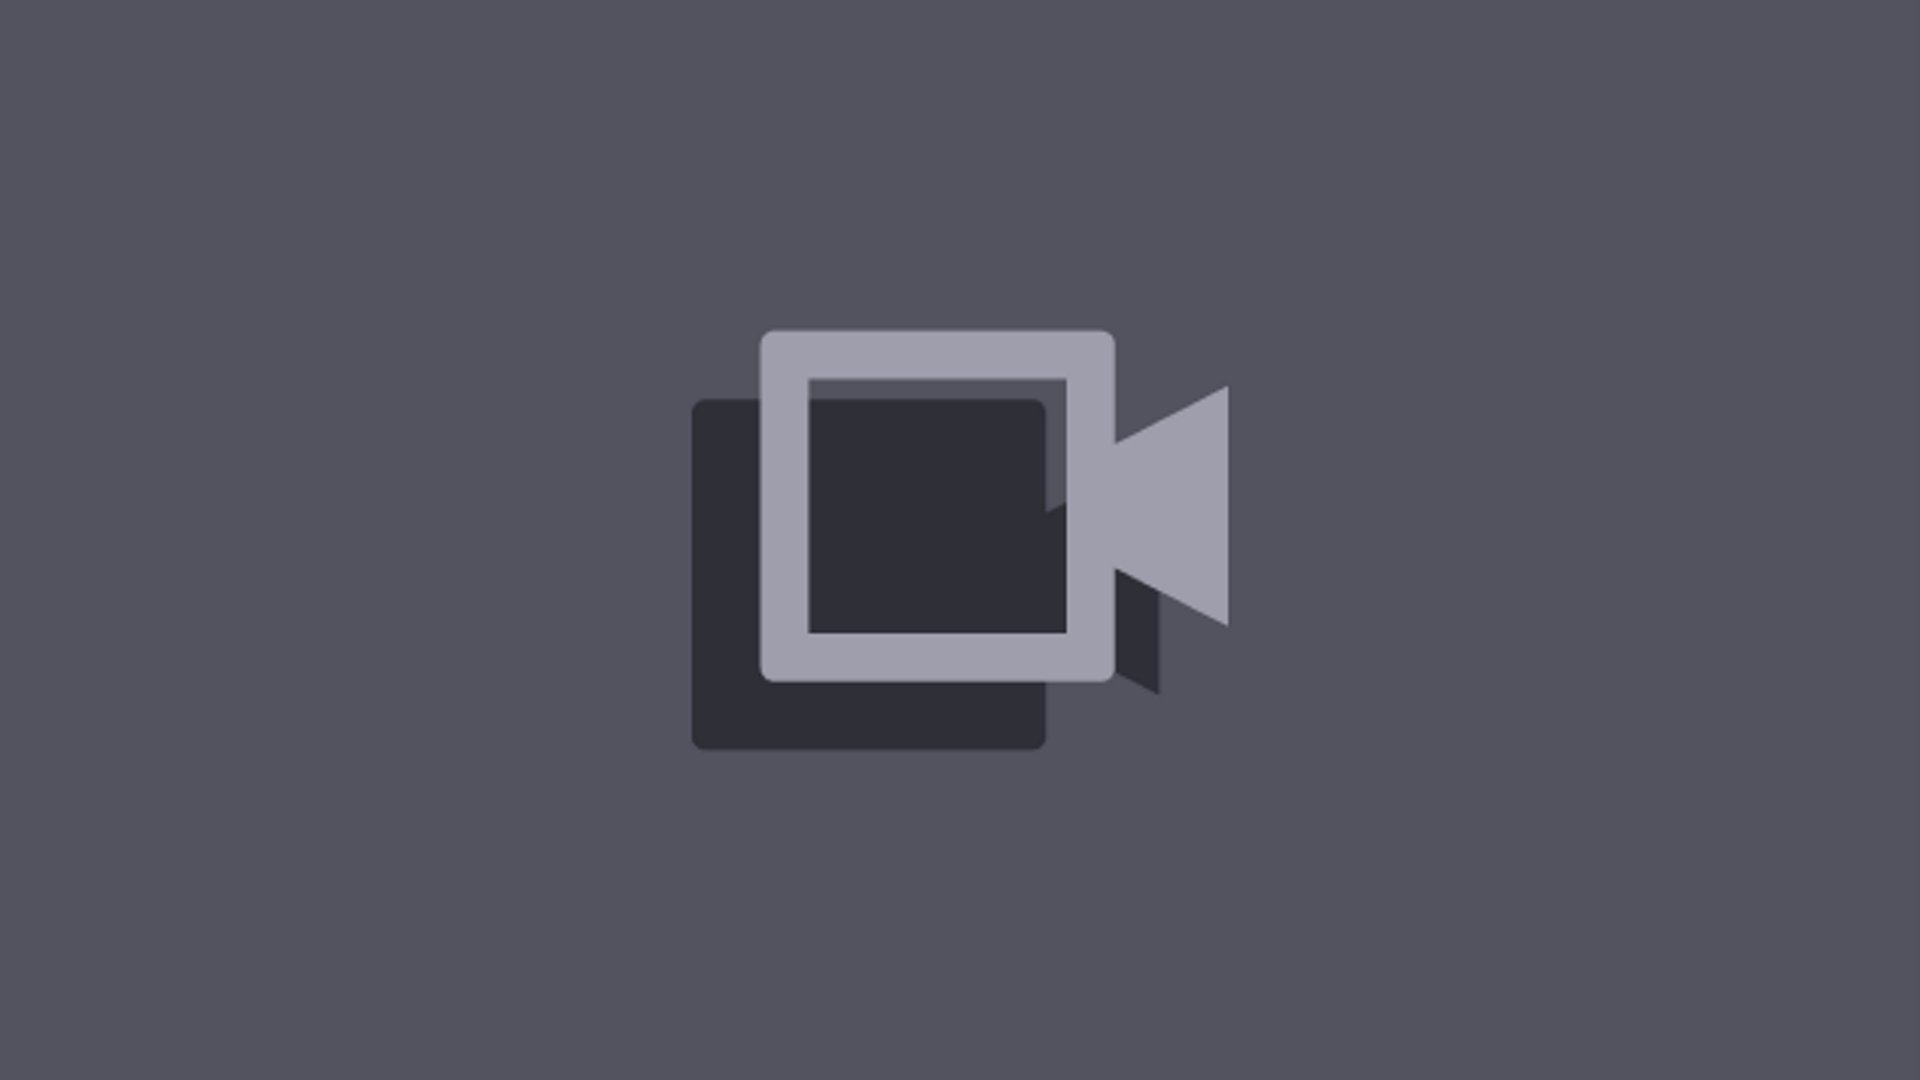 https://static-cdn.jtvnw.net/jtv_user_pictures/a_seagull-channel_offline_image-5da6310bc309caf7-1920x1080.png